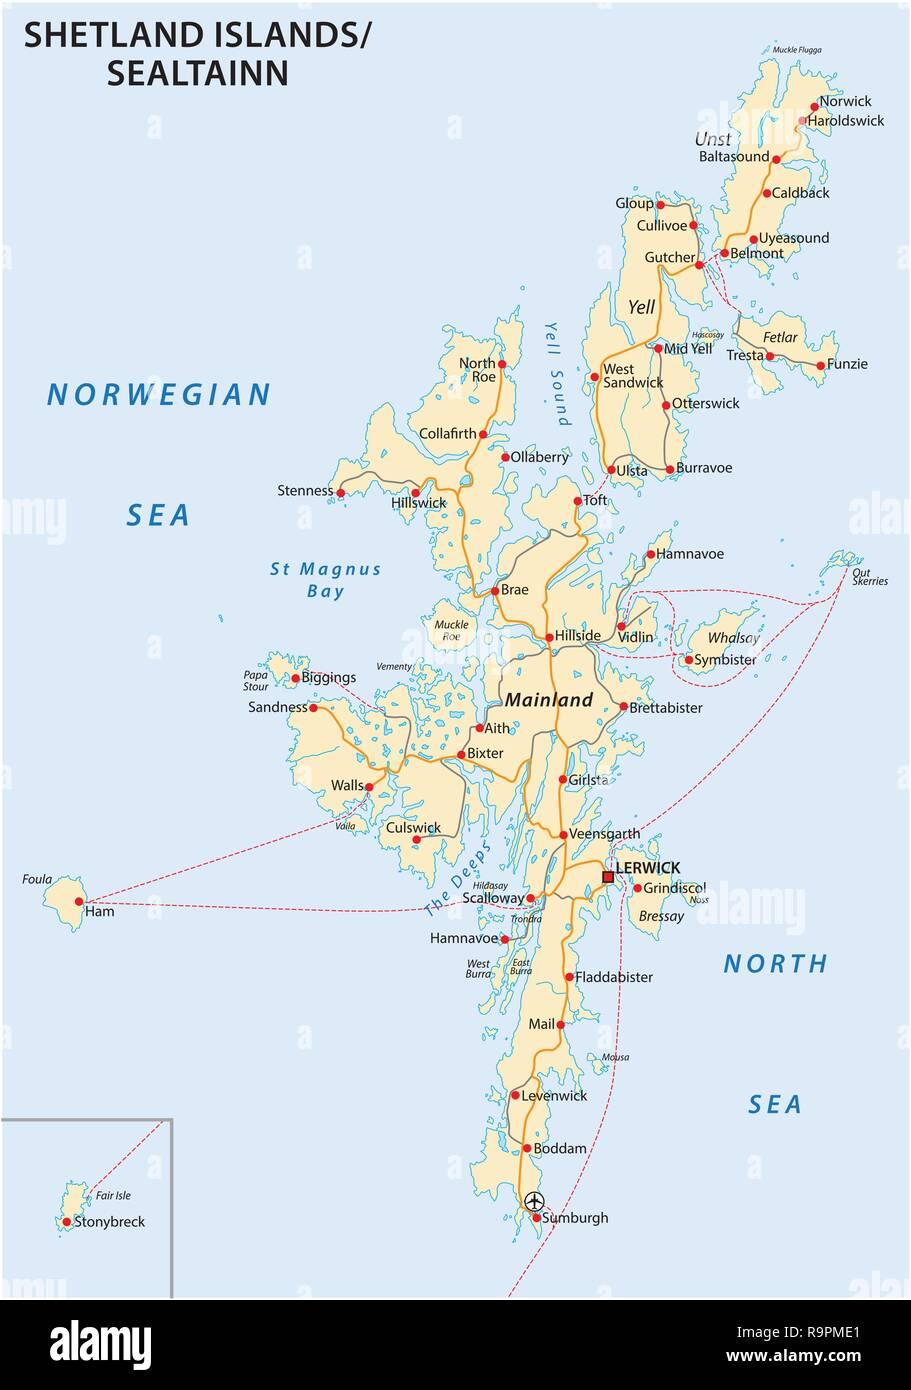 Shetland Inseln road map, Schottland, Vereinigtes Königreich Stockbild